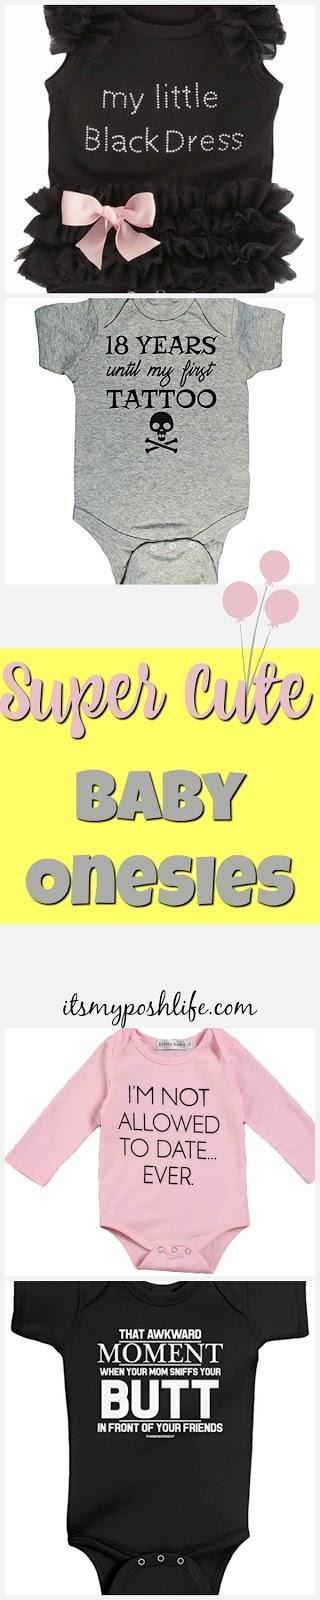 Super Cute Baby Onesies You Gotta See!